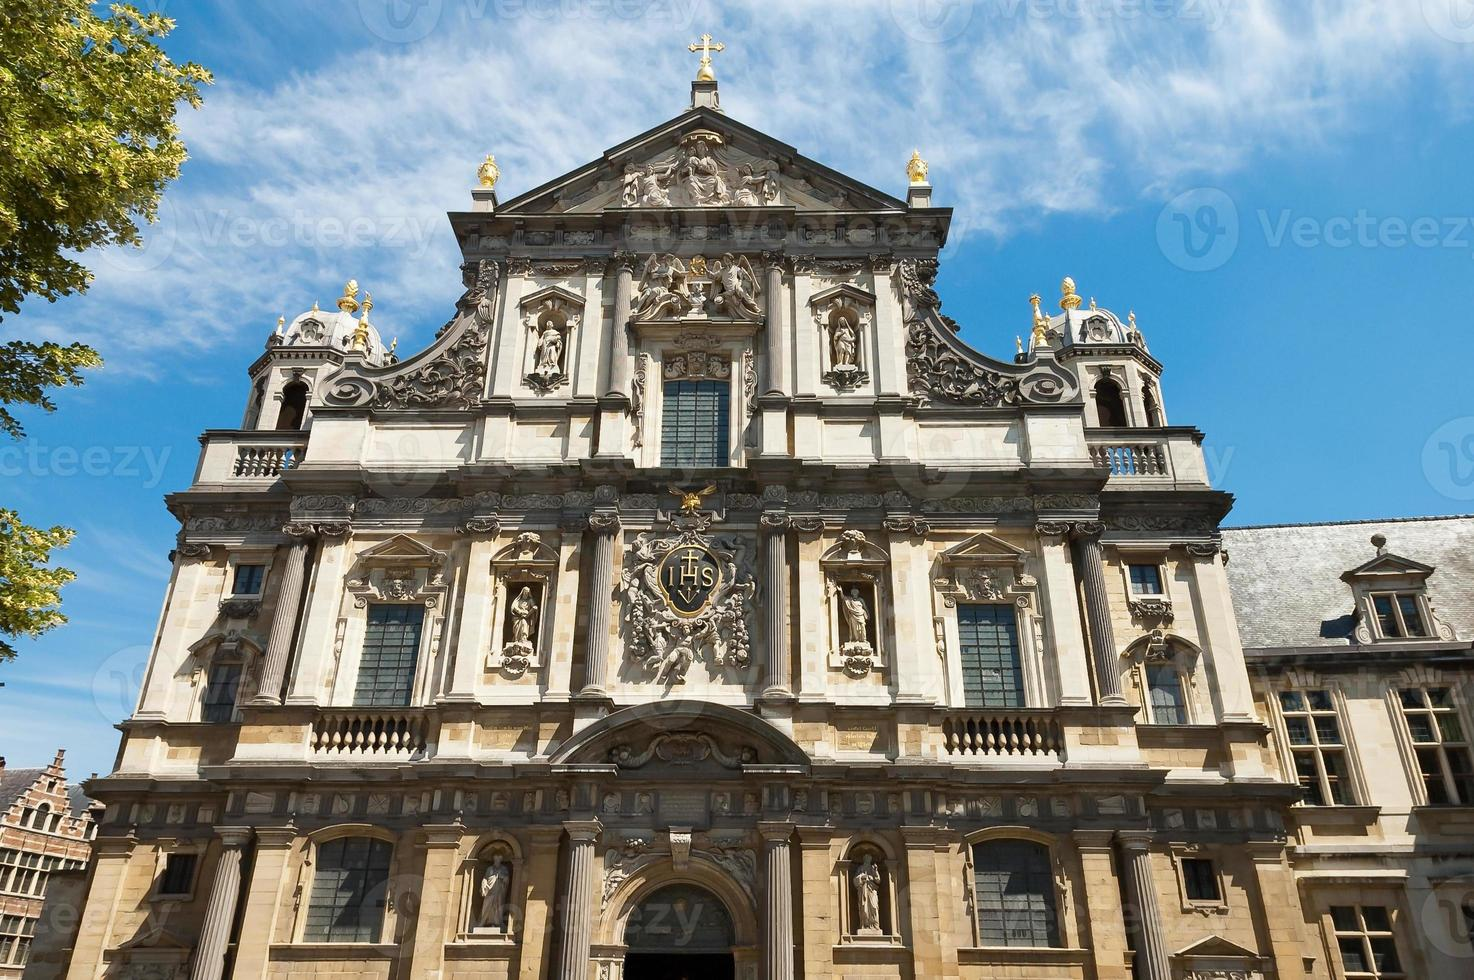 Carolus Borromeus Church in Antwerp, Belgium photo